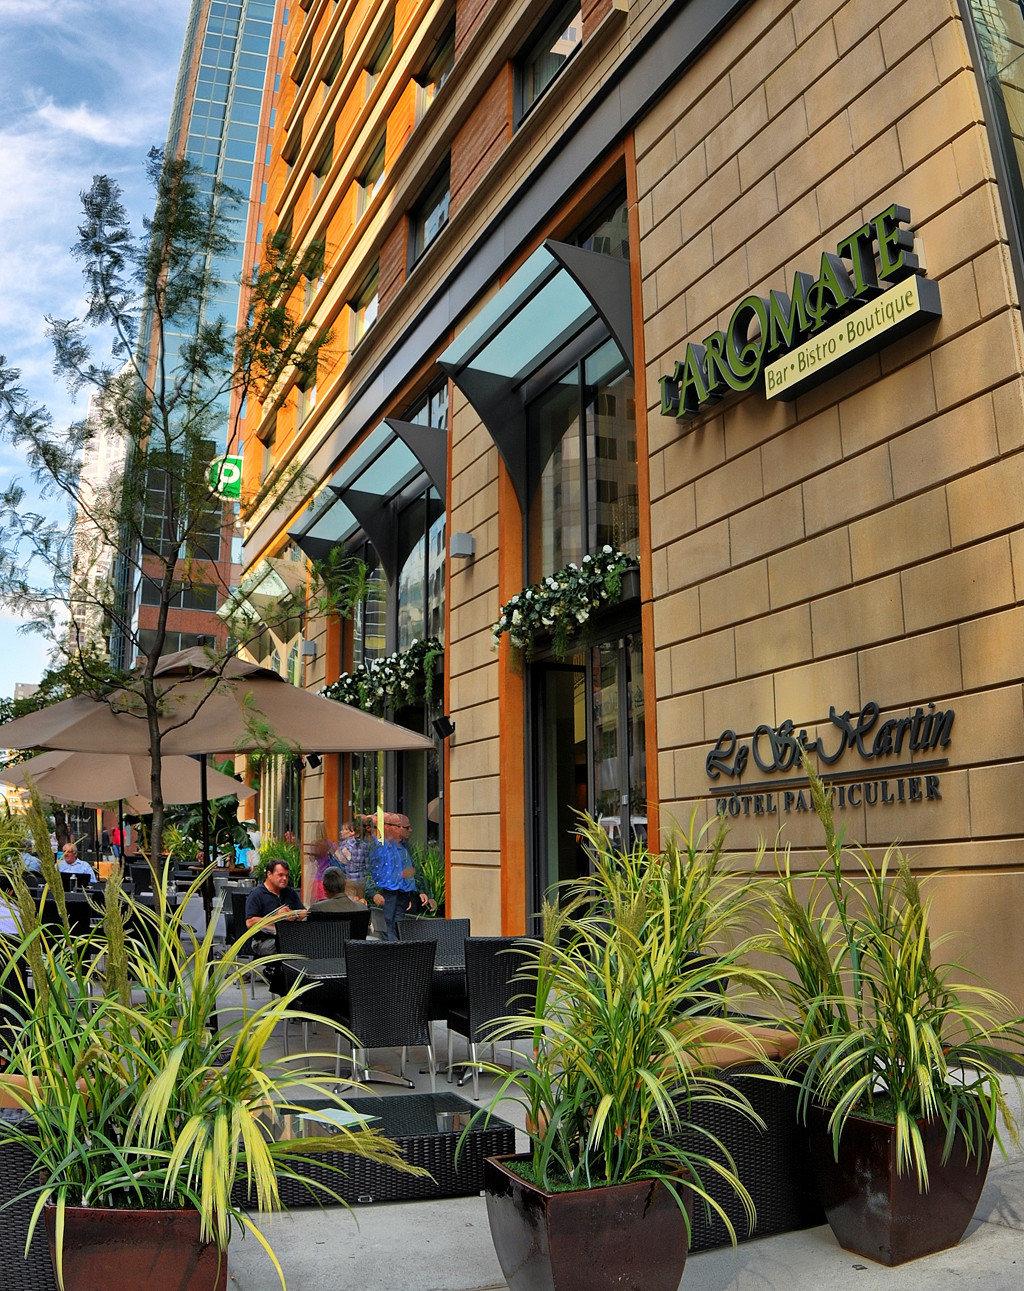 City Eco Modern building neighbourhood plant house residential area condominium home Courtyard arecales restaurant Resort Garden